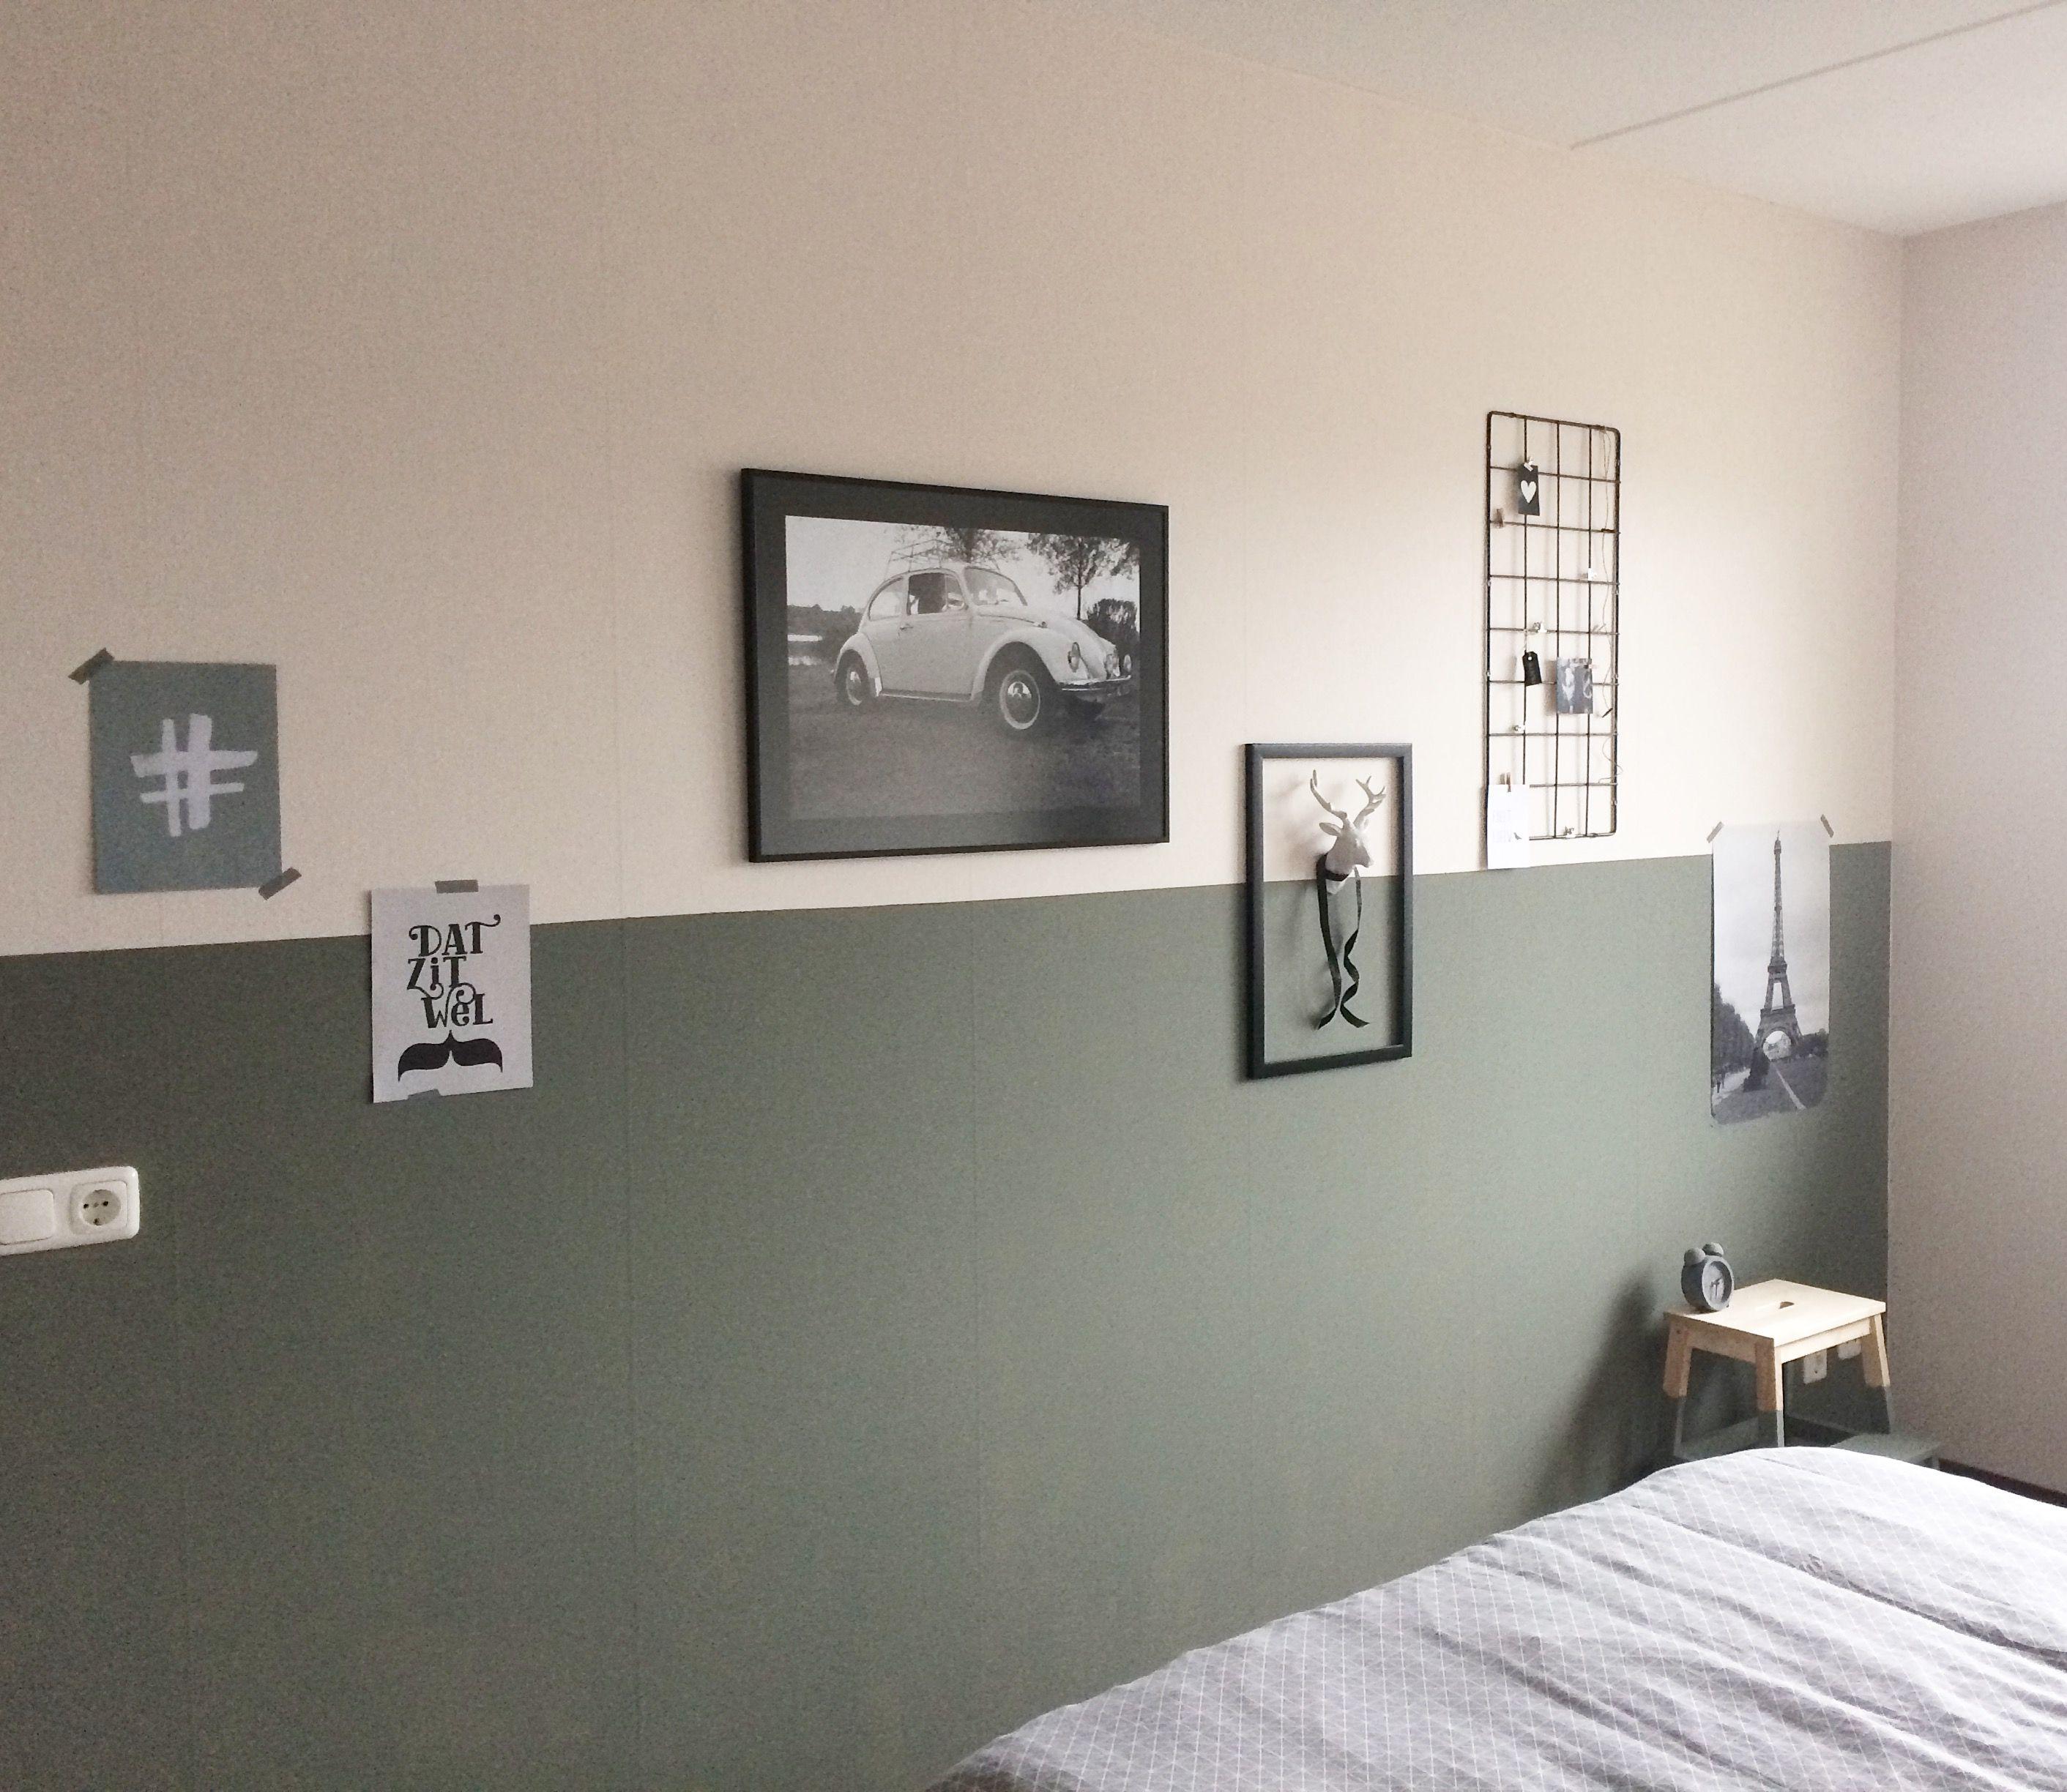 Slaapkamer muurdecoratie 2017 decor blu - Muur decoratie slaapkamer ...